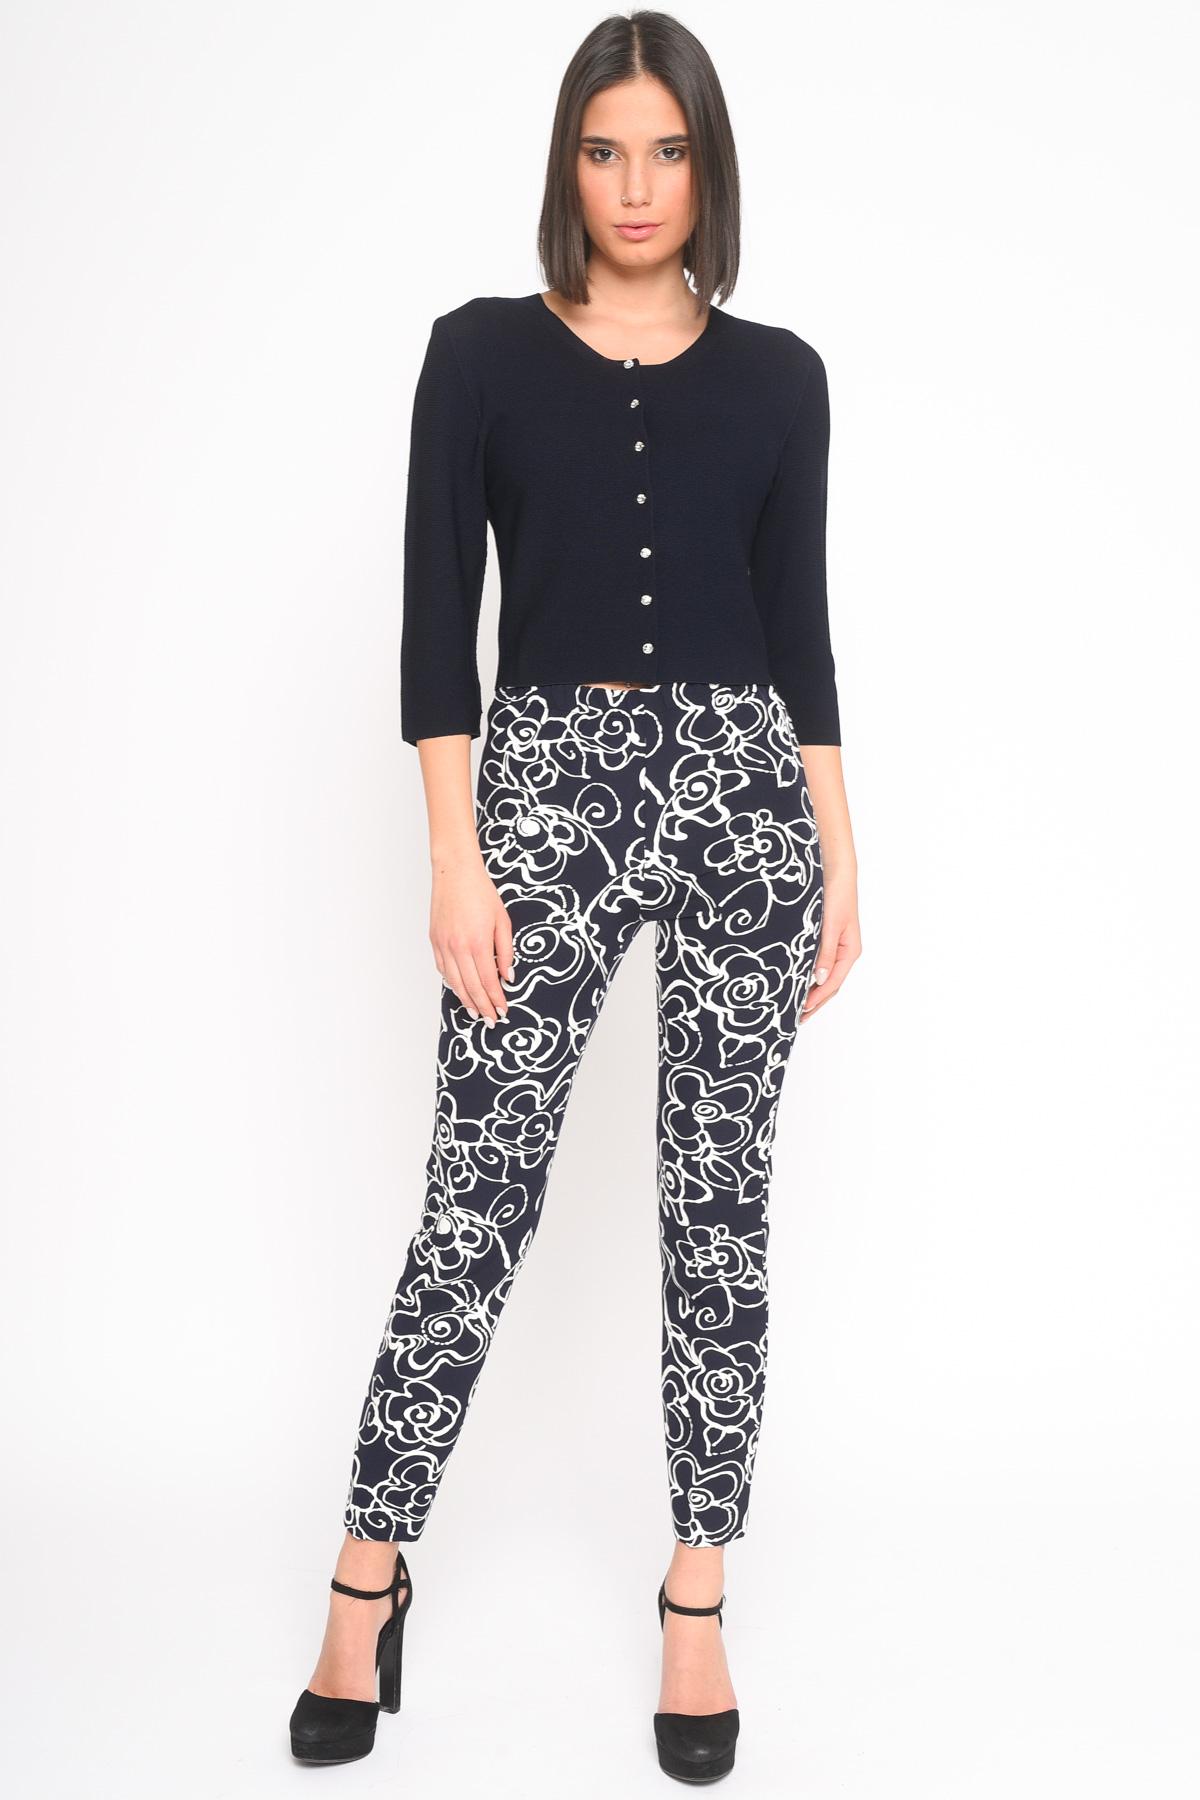 PANTALONE A FIORI B&W for women - BLUE - Paquito Pronto Moda Shop Online